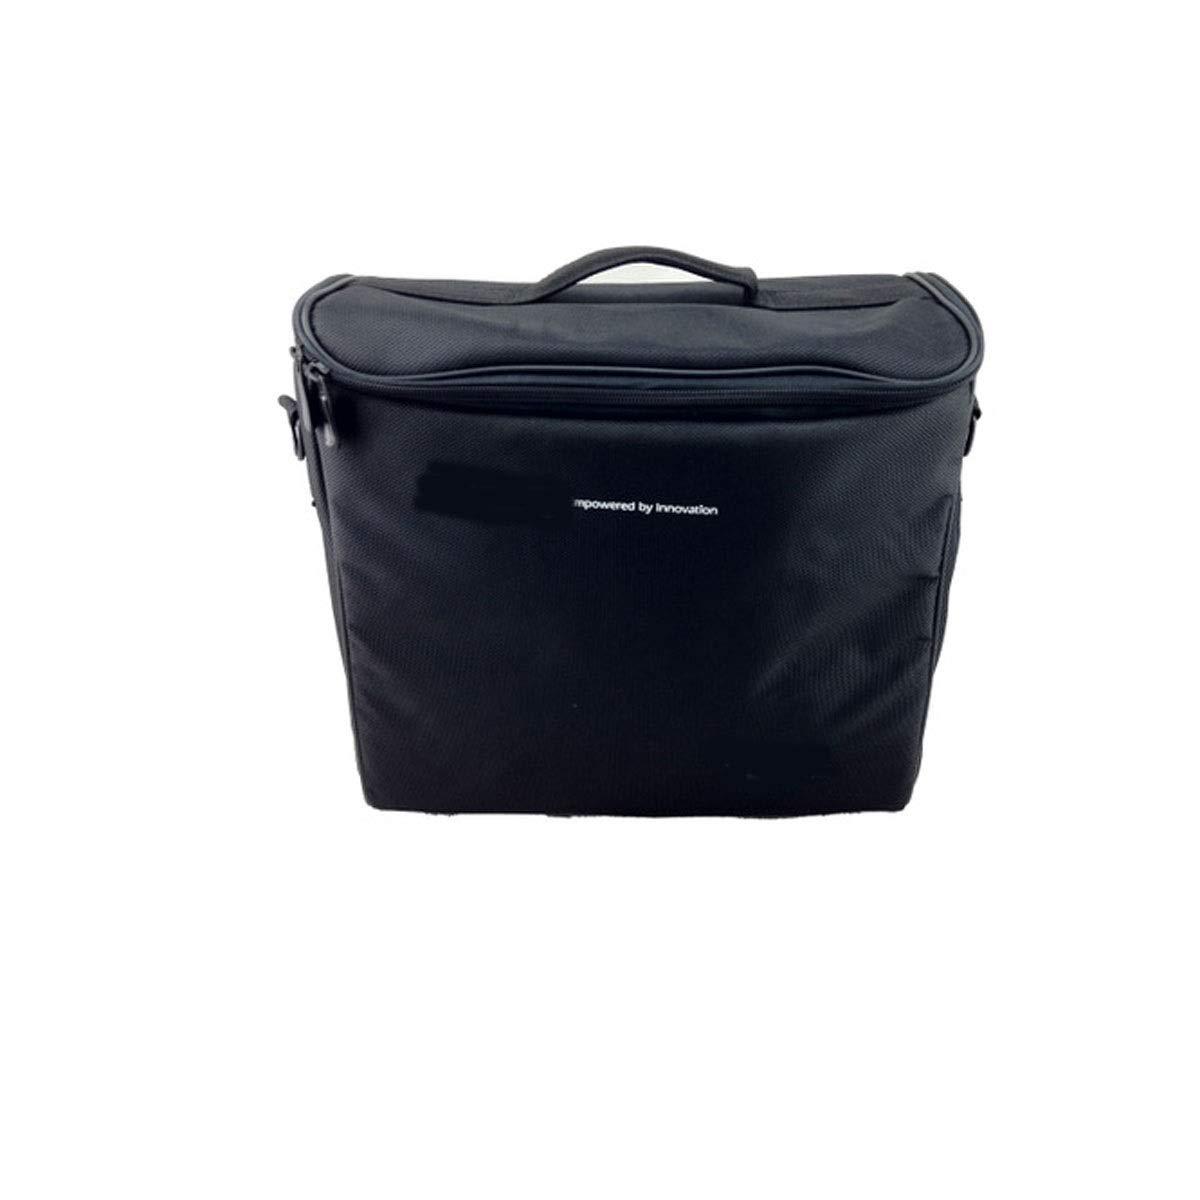 Huijunwenti Accessories Organizer,Carry case for Projector, Universal Portable Bag (Color : Black)